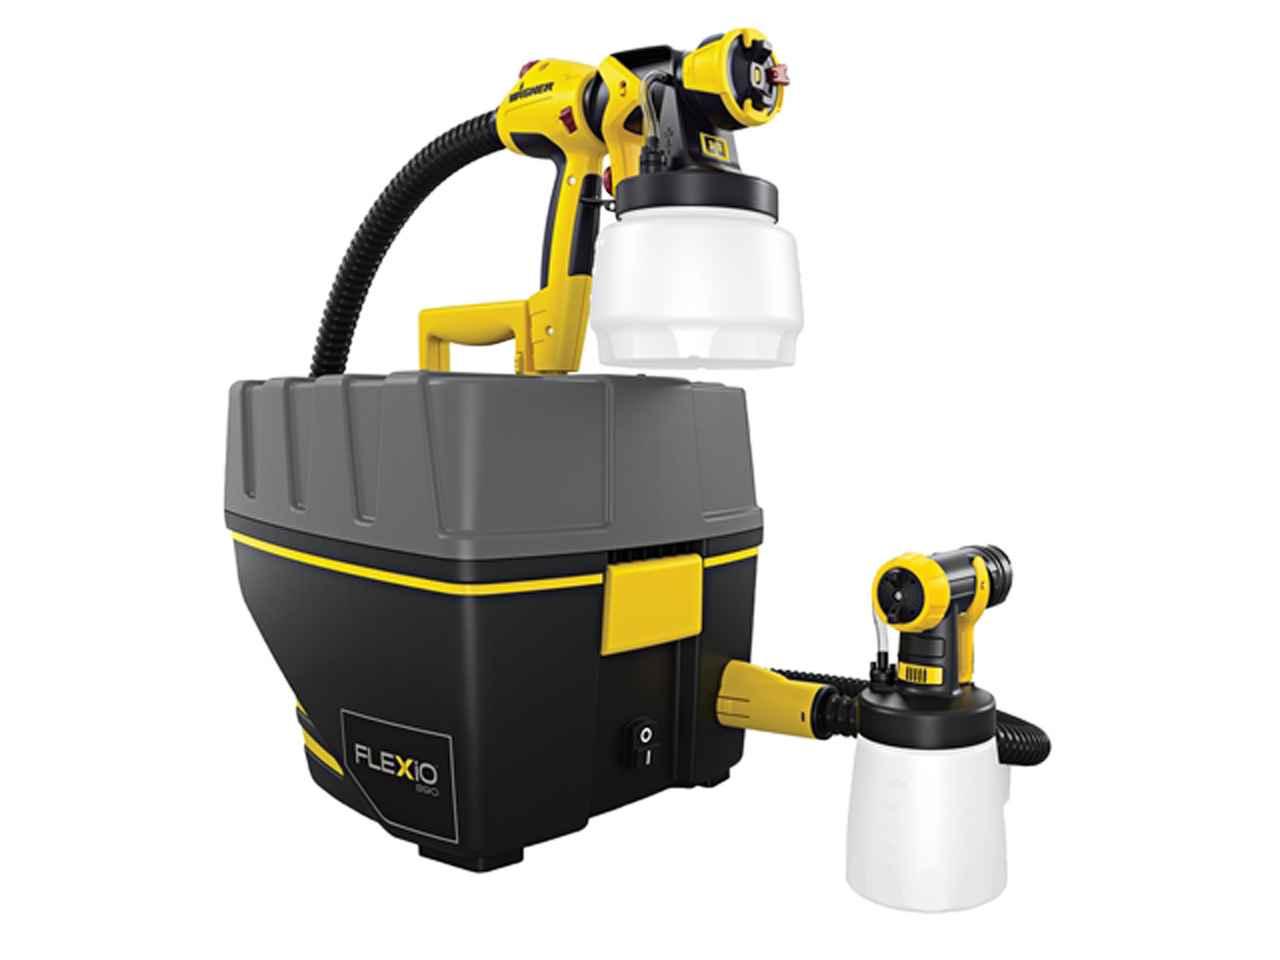 wagner wagw890 630w 240v universal sprayer. Black Bedroom Furniture Sets. Home Design Ideas